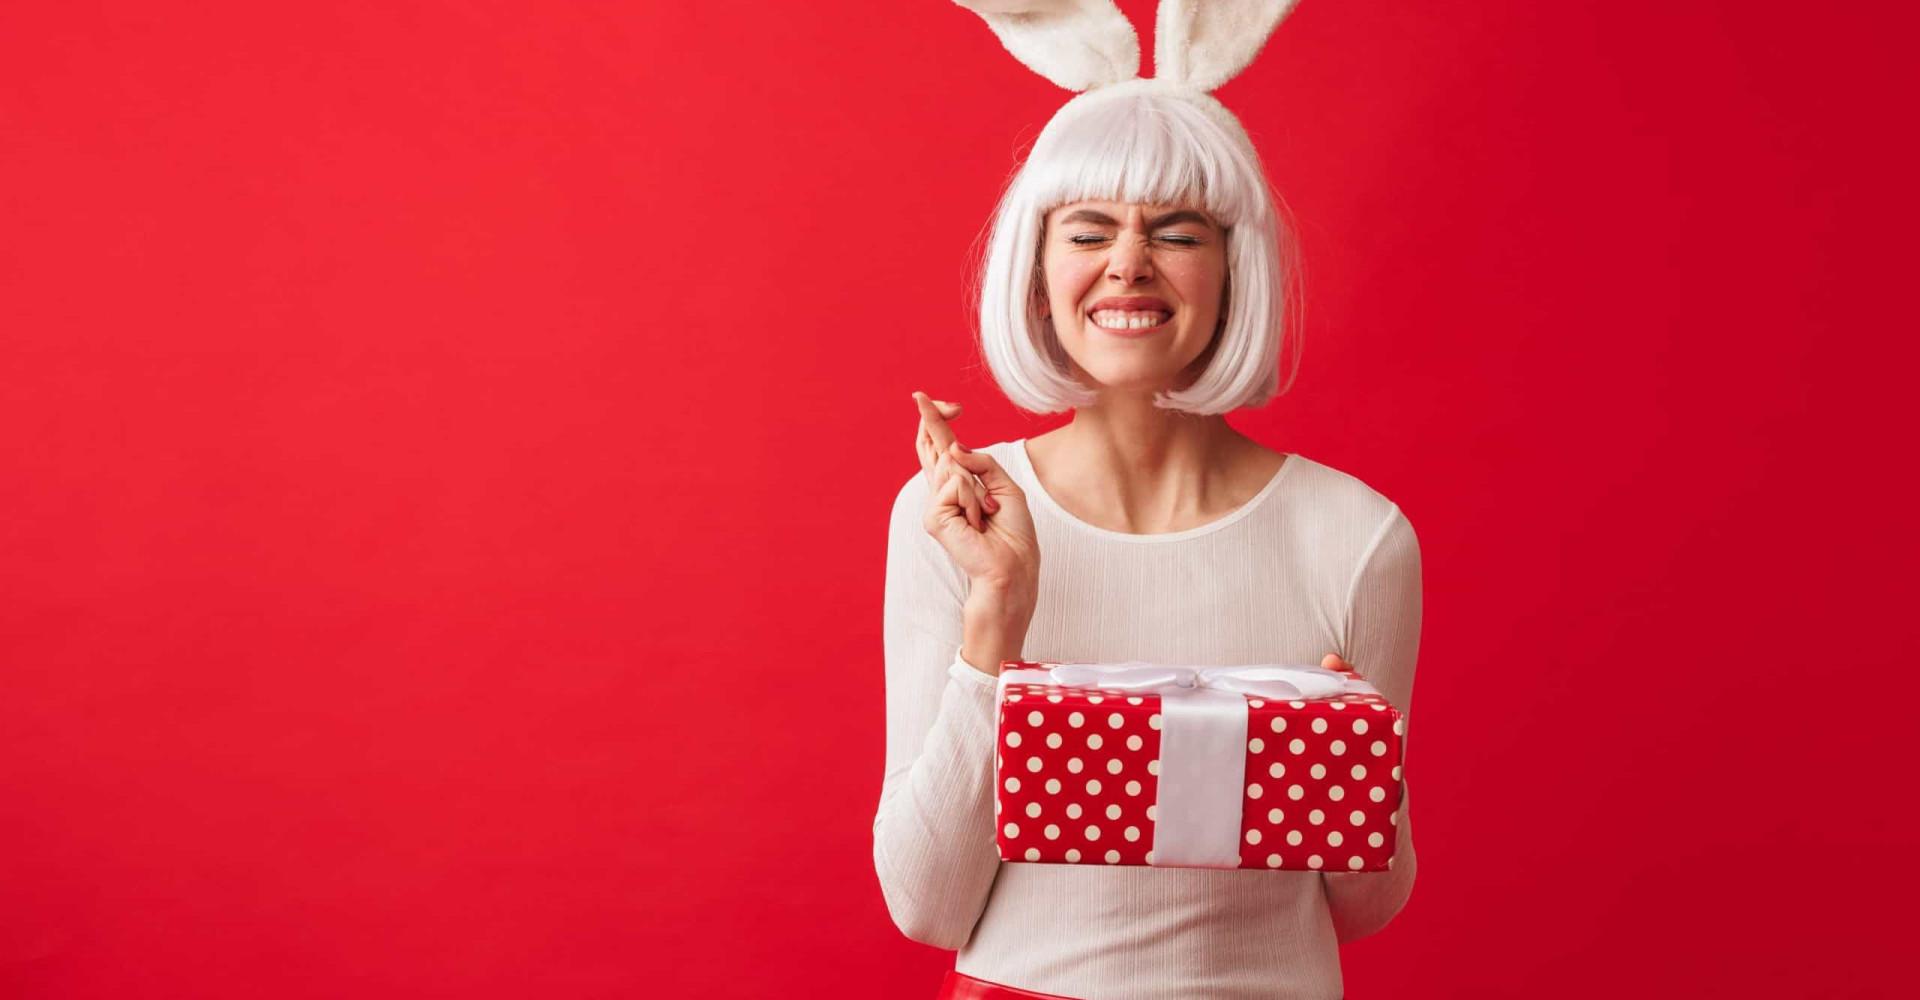 Noël express: des cadeaux en retard, mais sans stress!